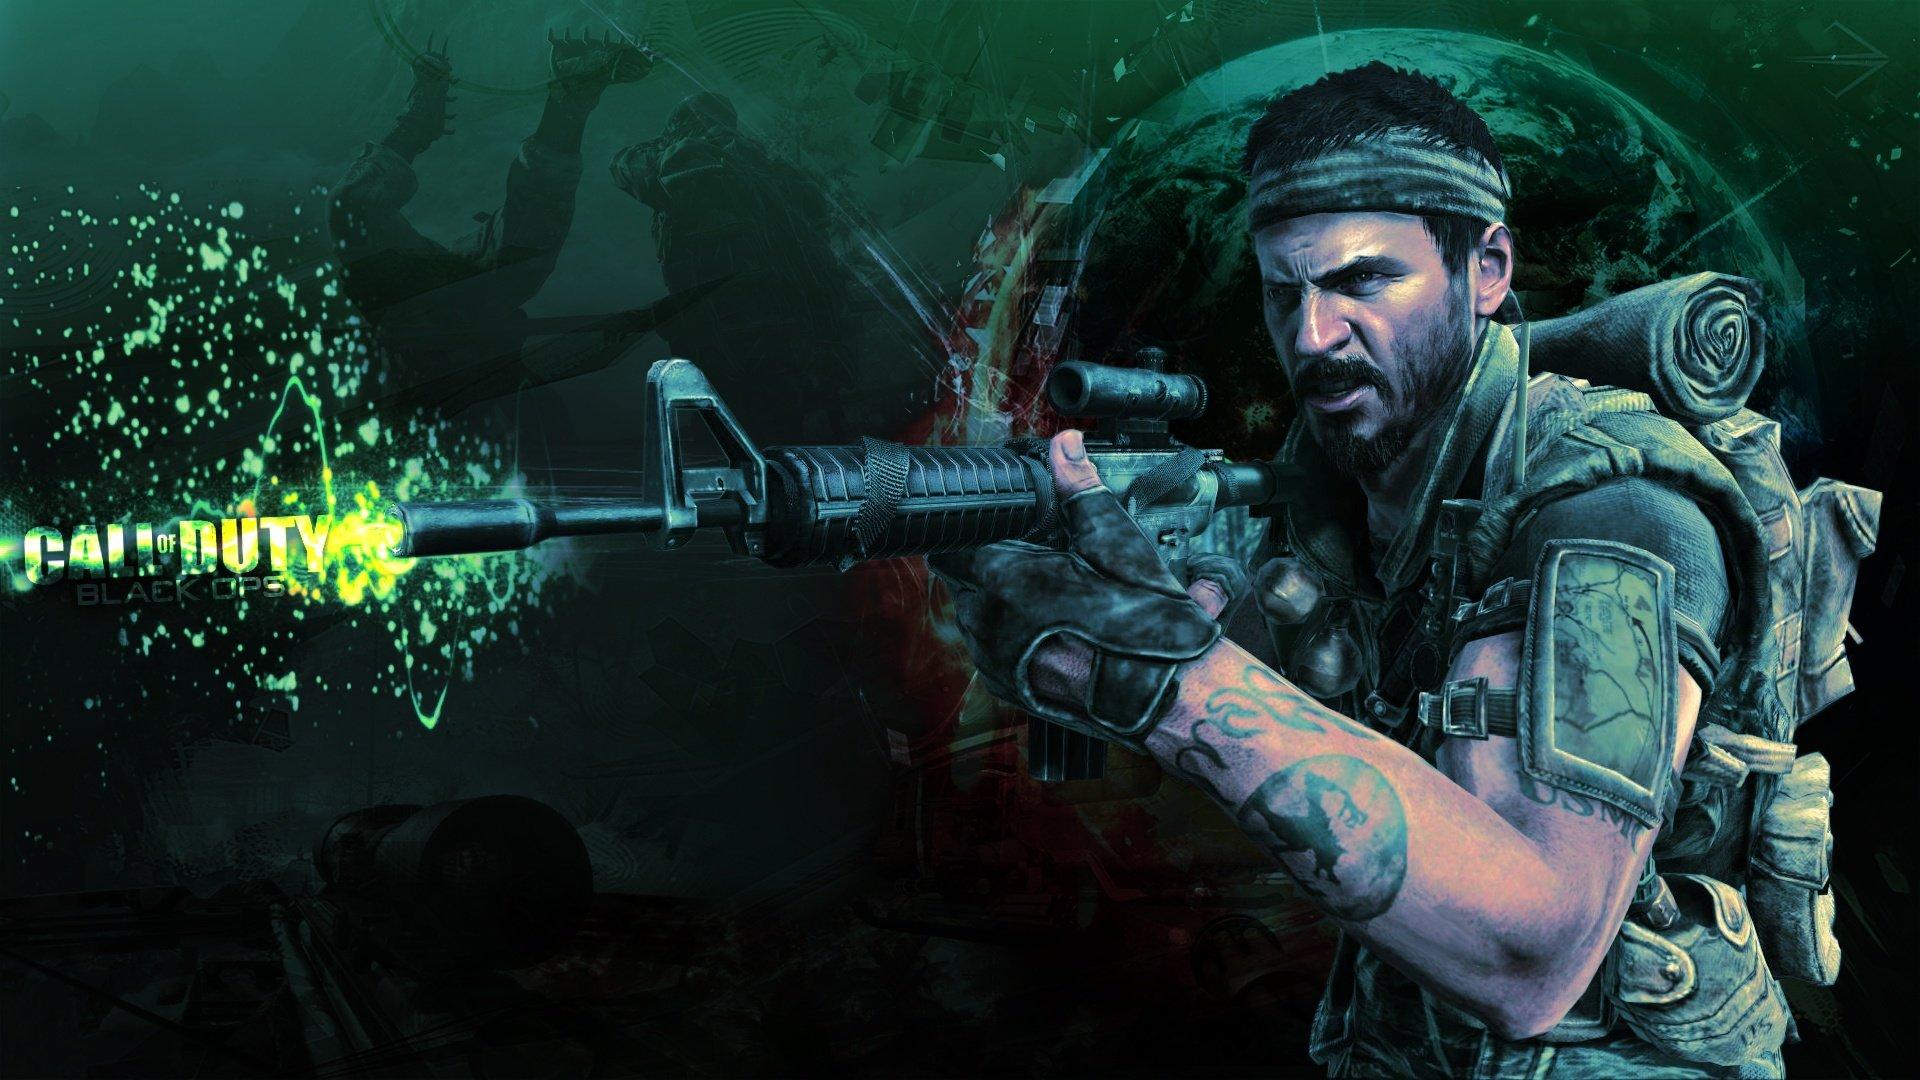 Best Call Of Duty Black Ops Wallpaper ID70176 For High Resolution 1080p Desktop